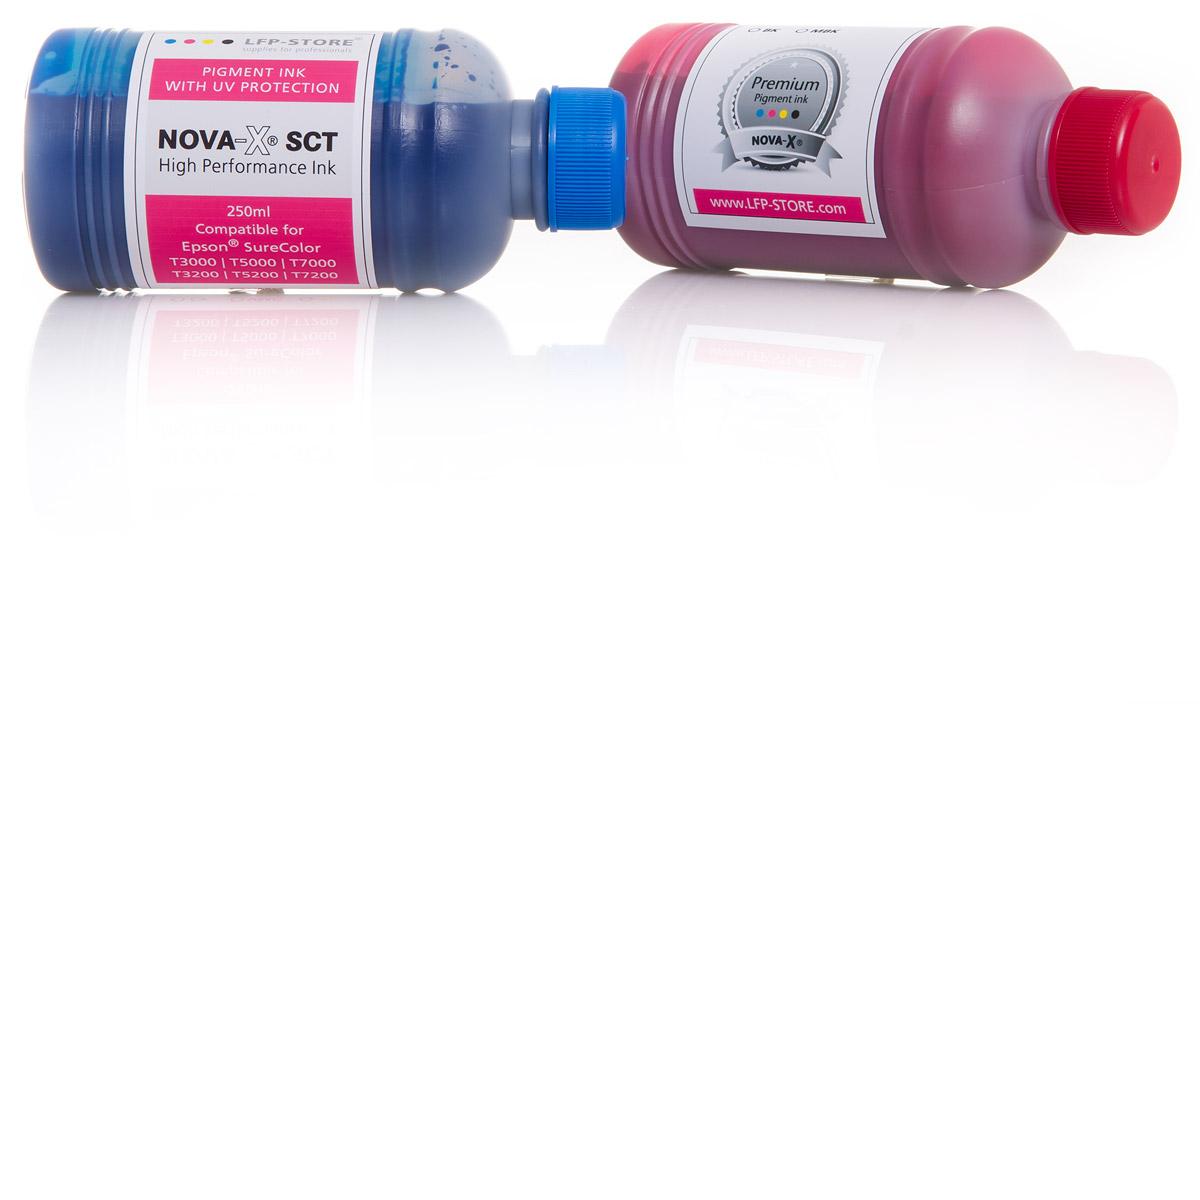 250ml NOVA-X® SCT Tinte kompatibel für Epson® SureColor SC- T3200 T5200 T7200